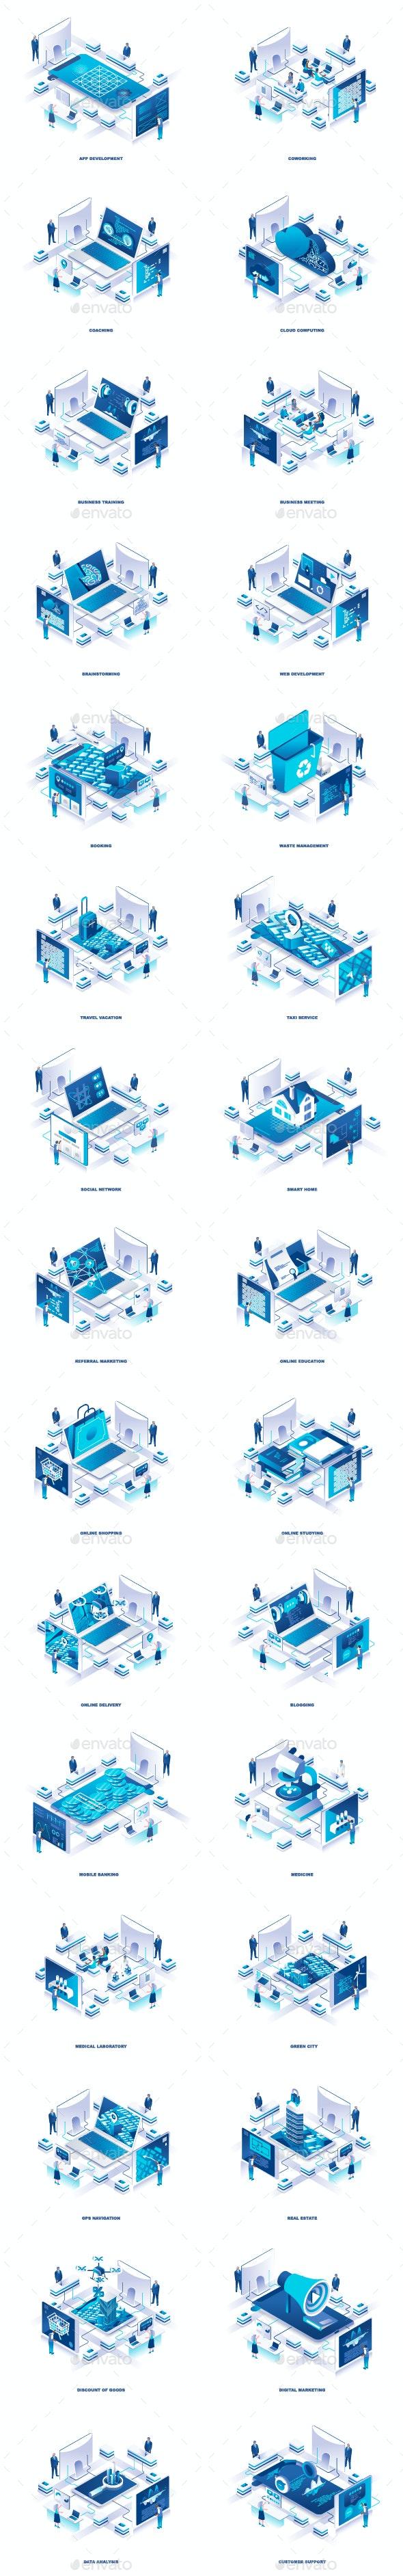 Flat Isometric 3D Illustration - Web Elements Vectors